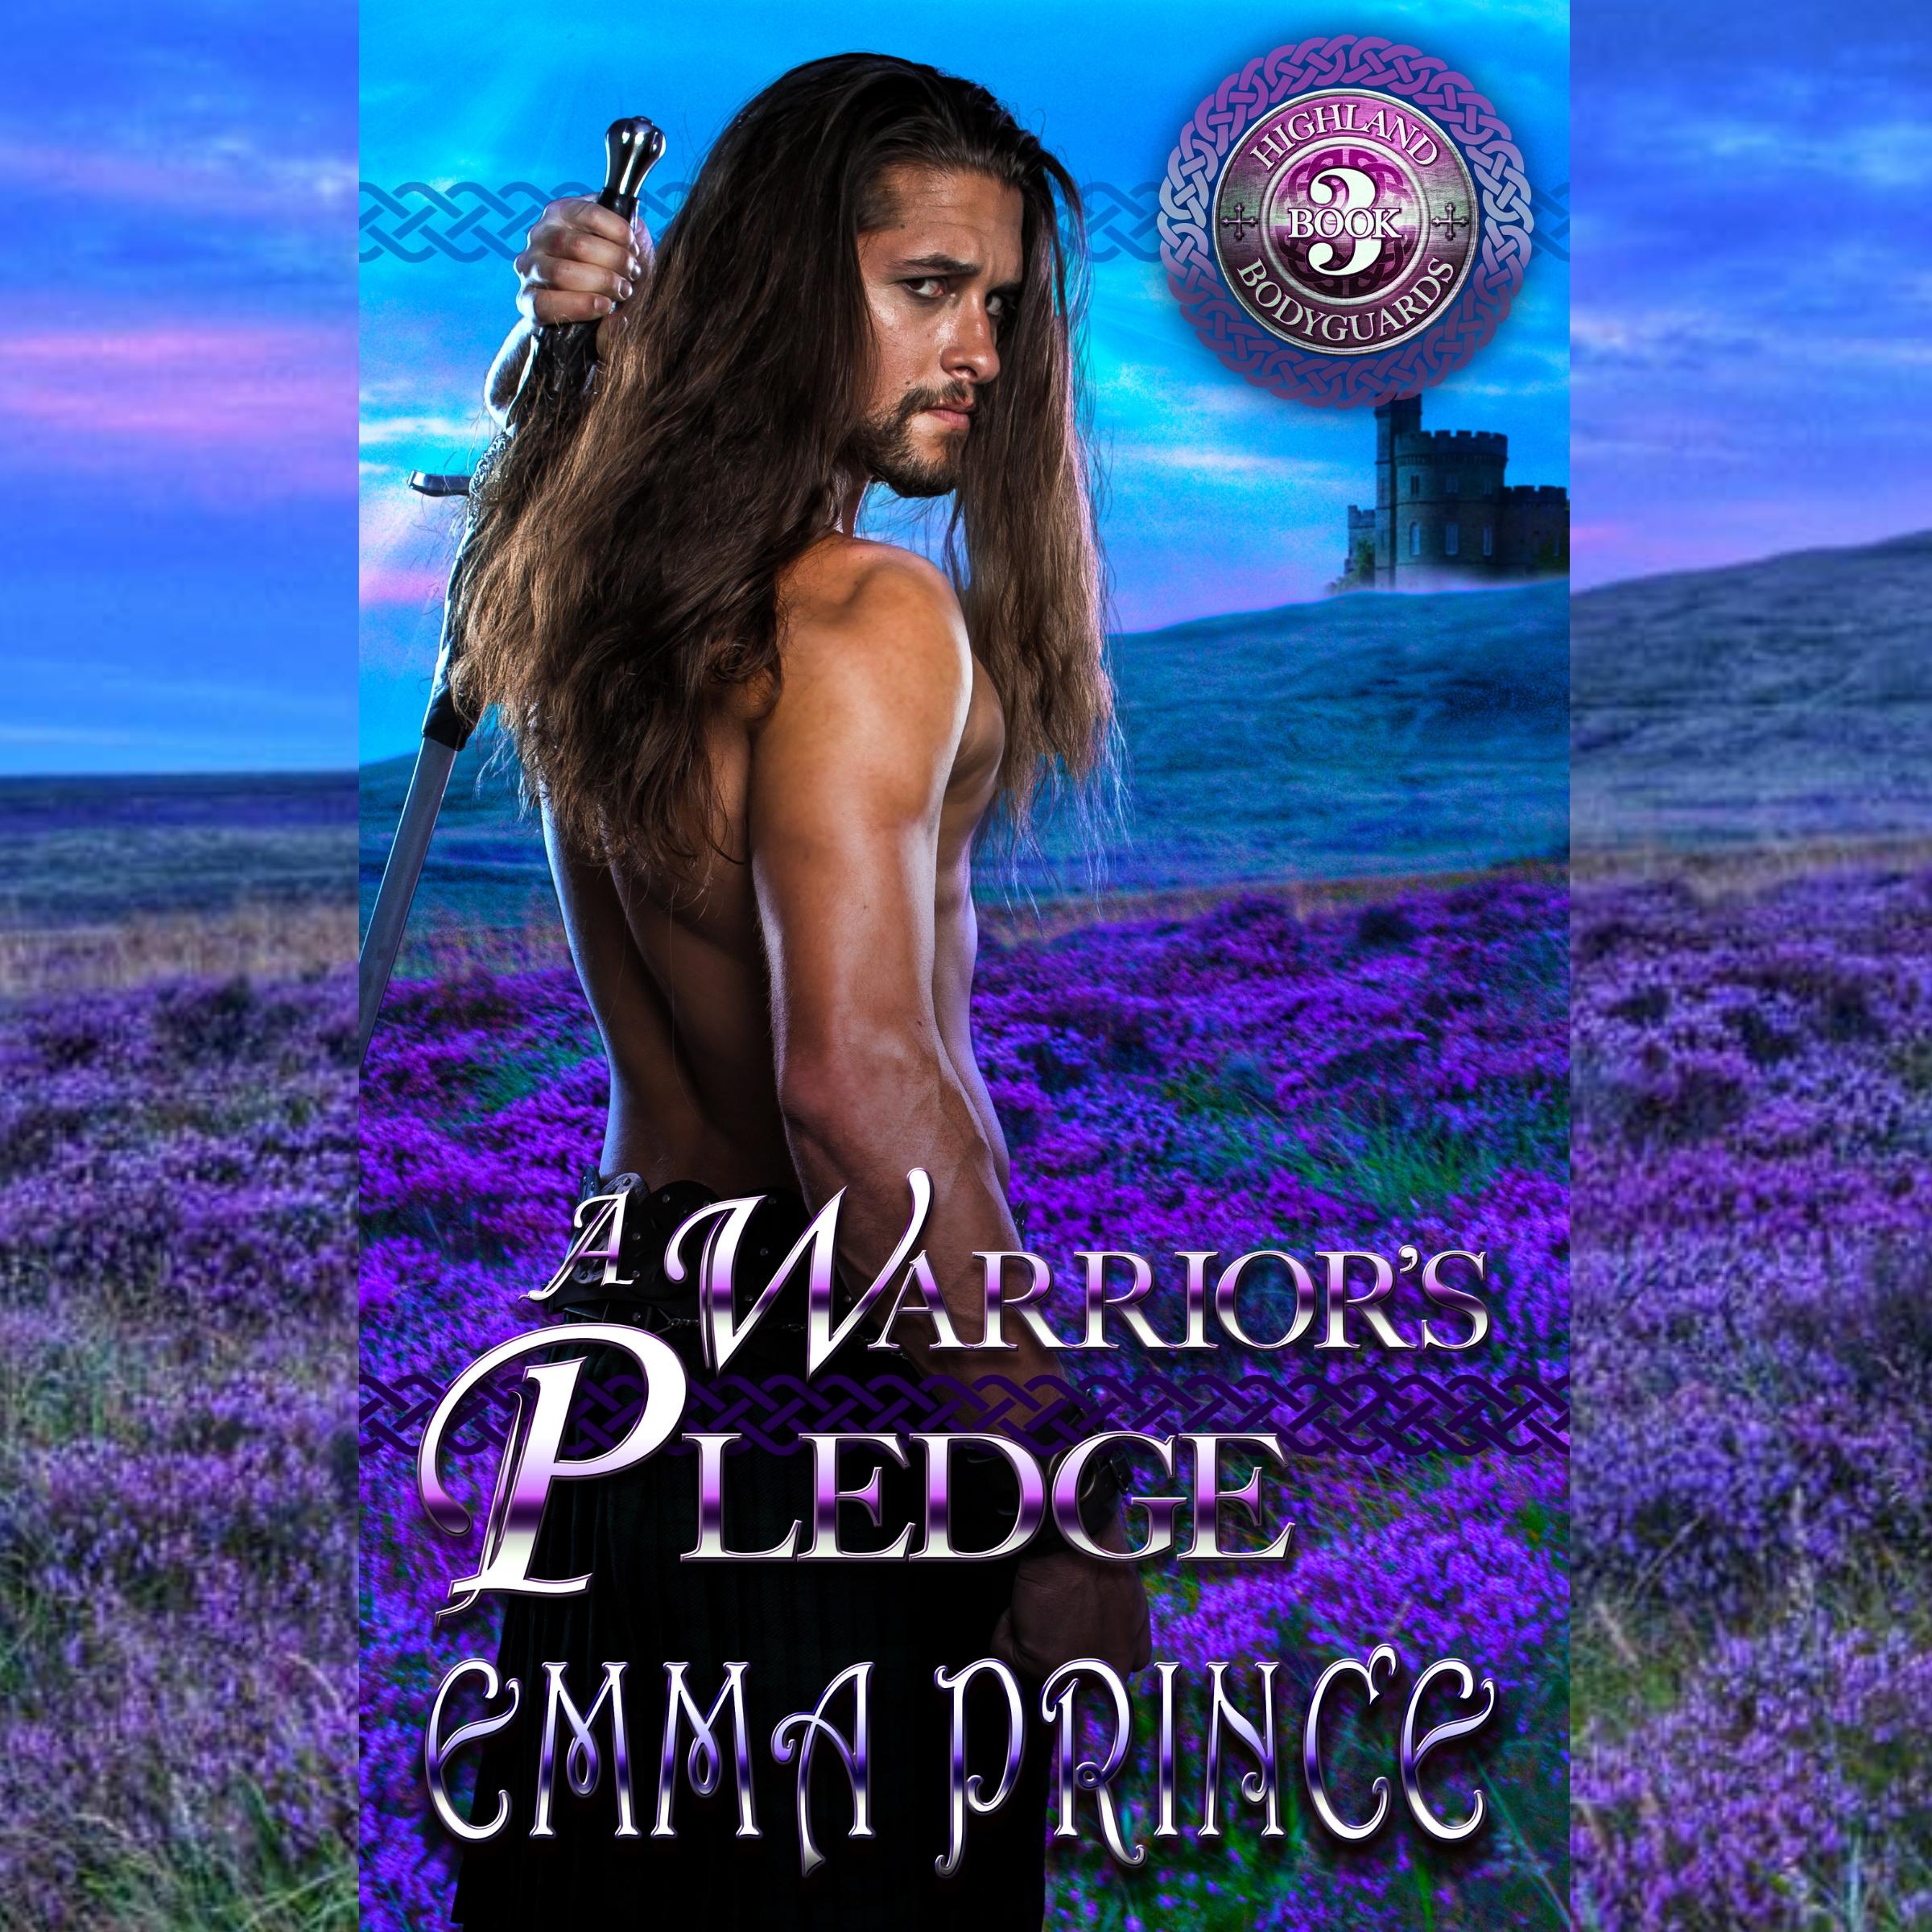 A Warrior's Pledge AUDIO cover.jpg